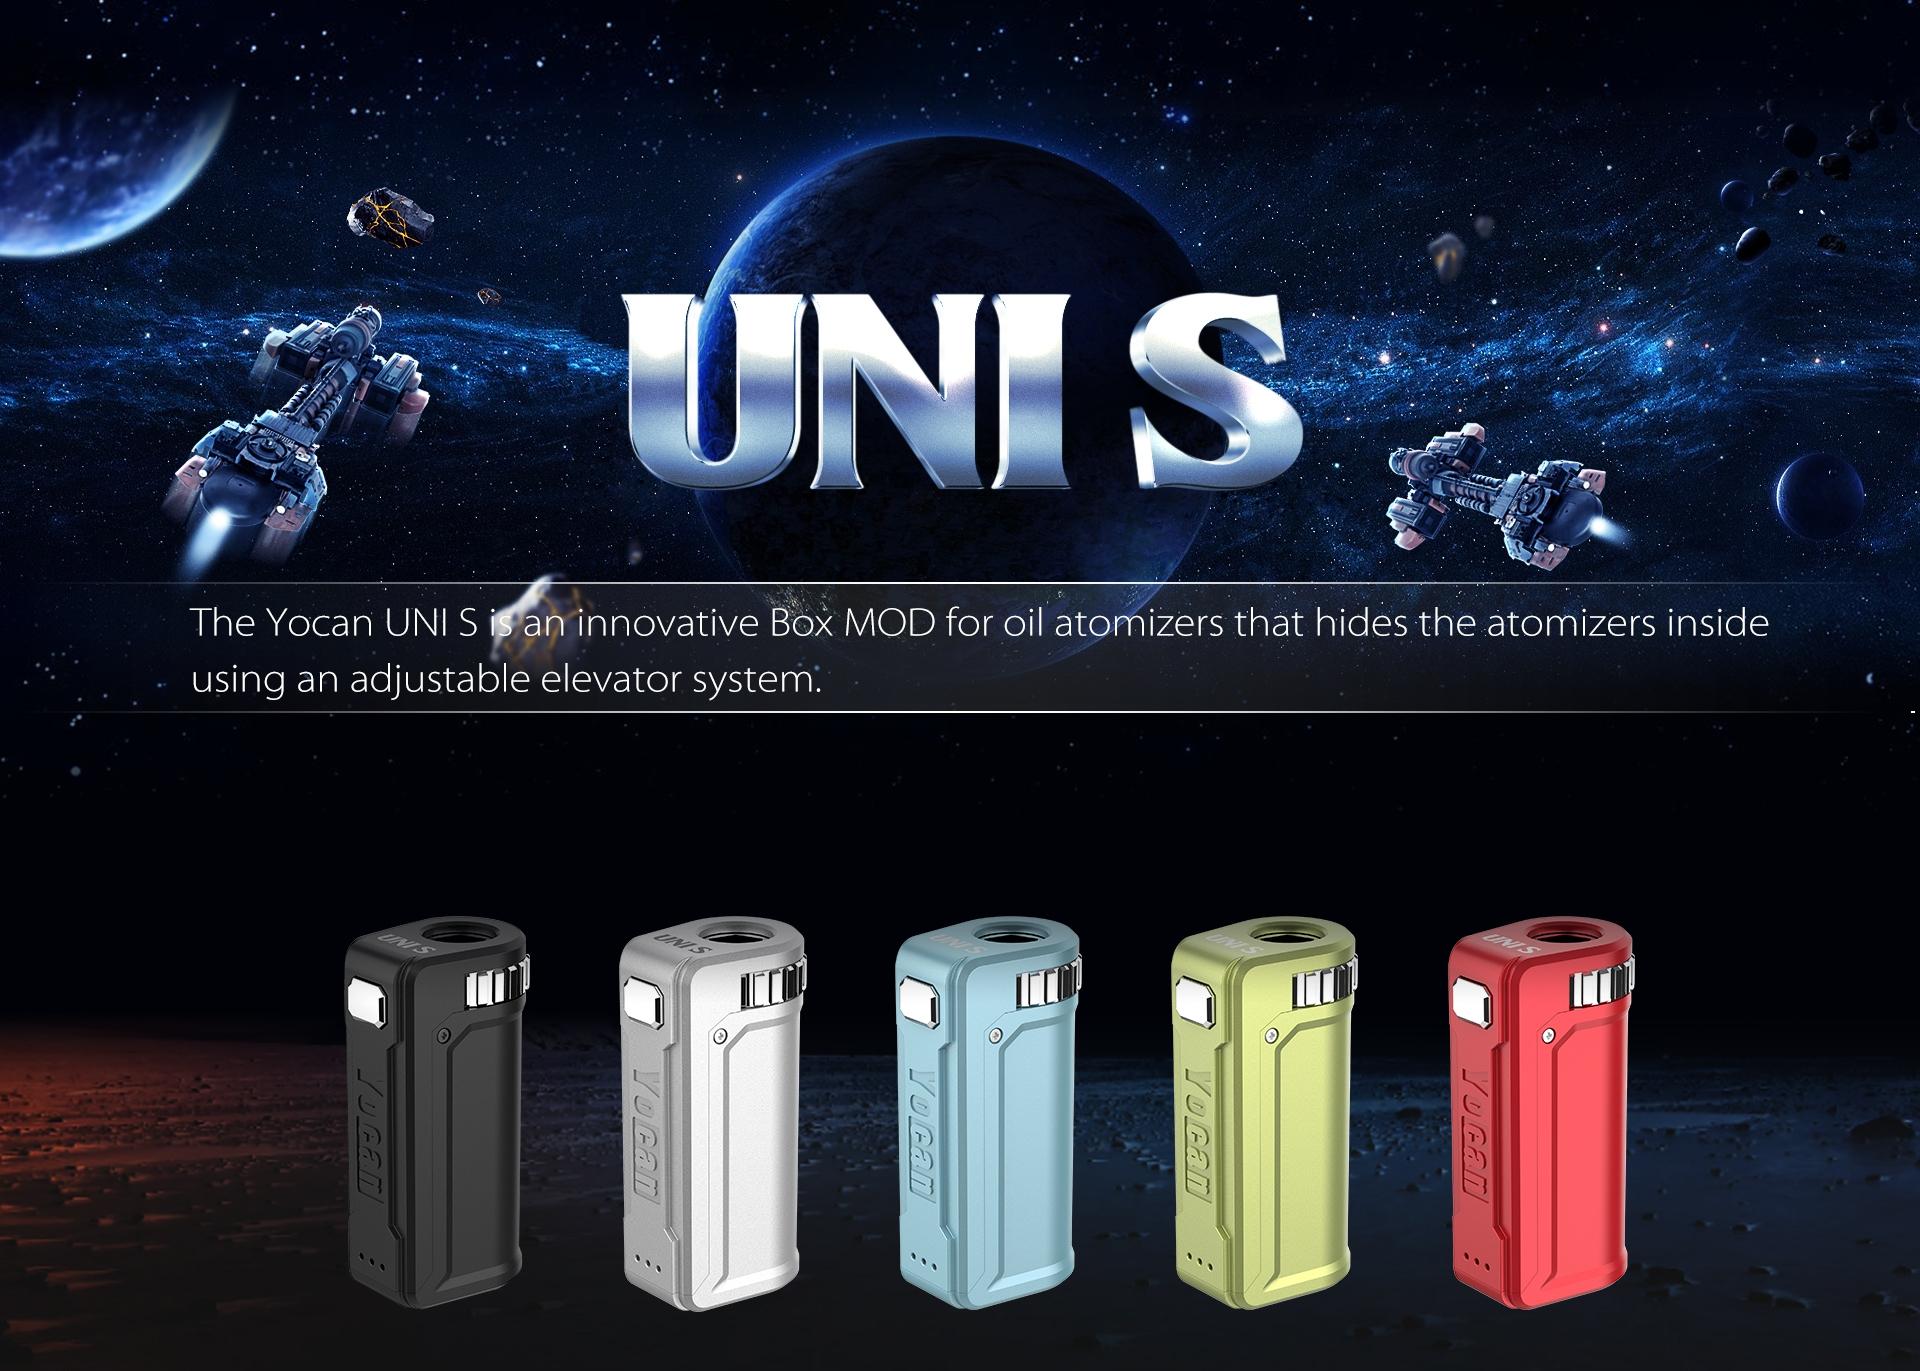 Yocan UNI S Box Mod is an innovative VV Box MOD.